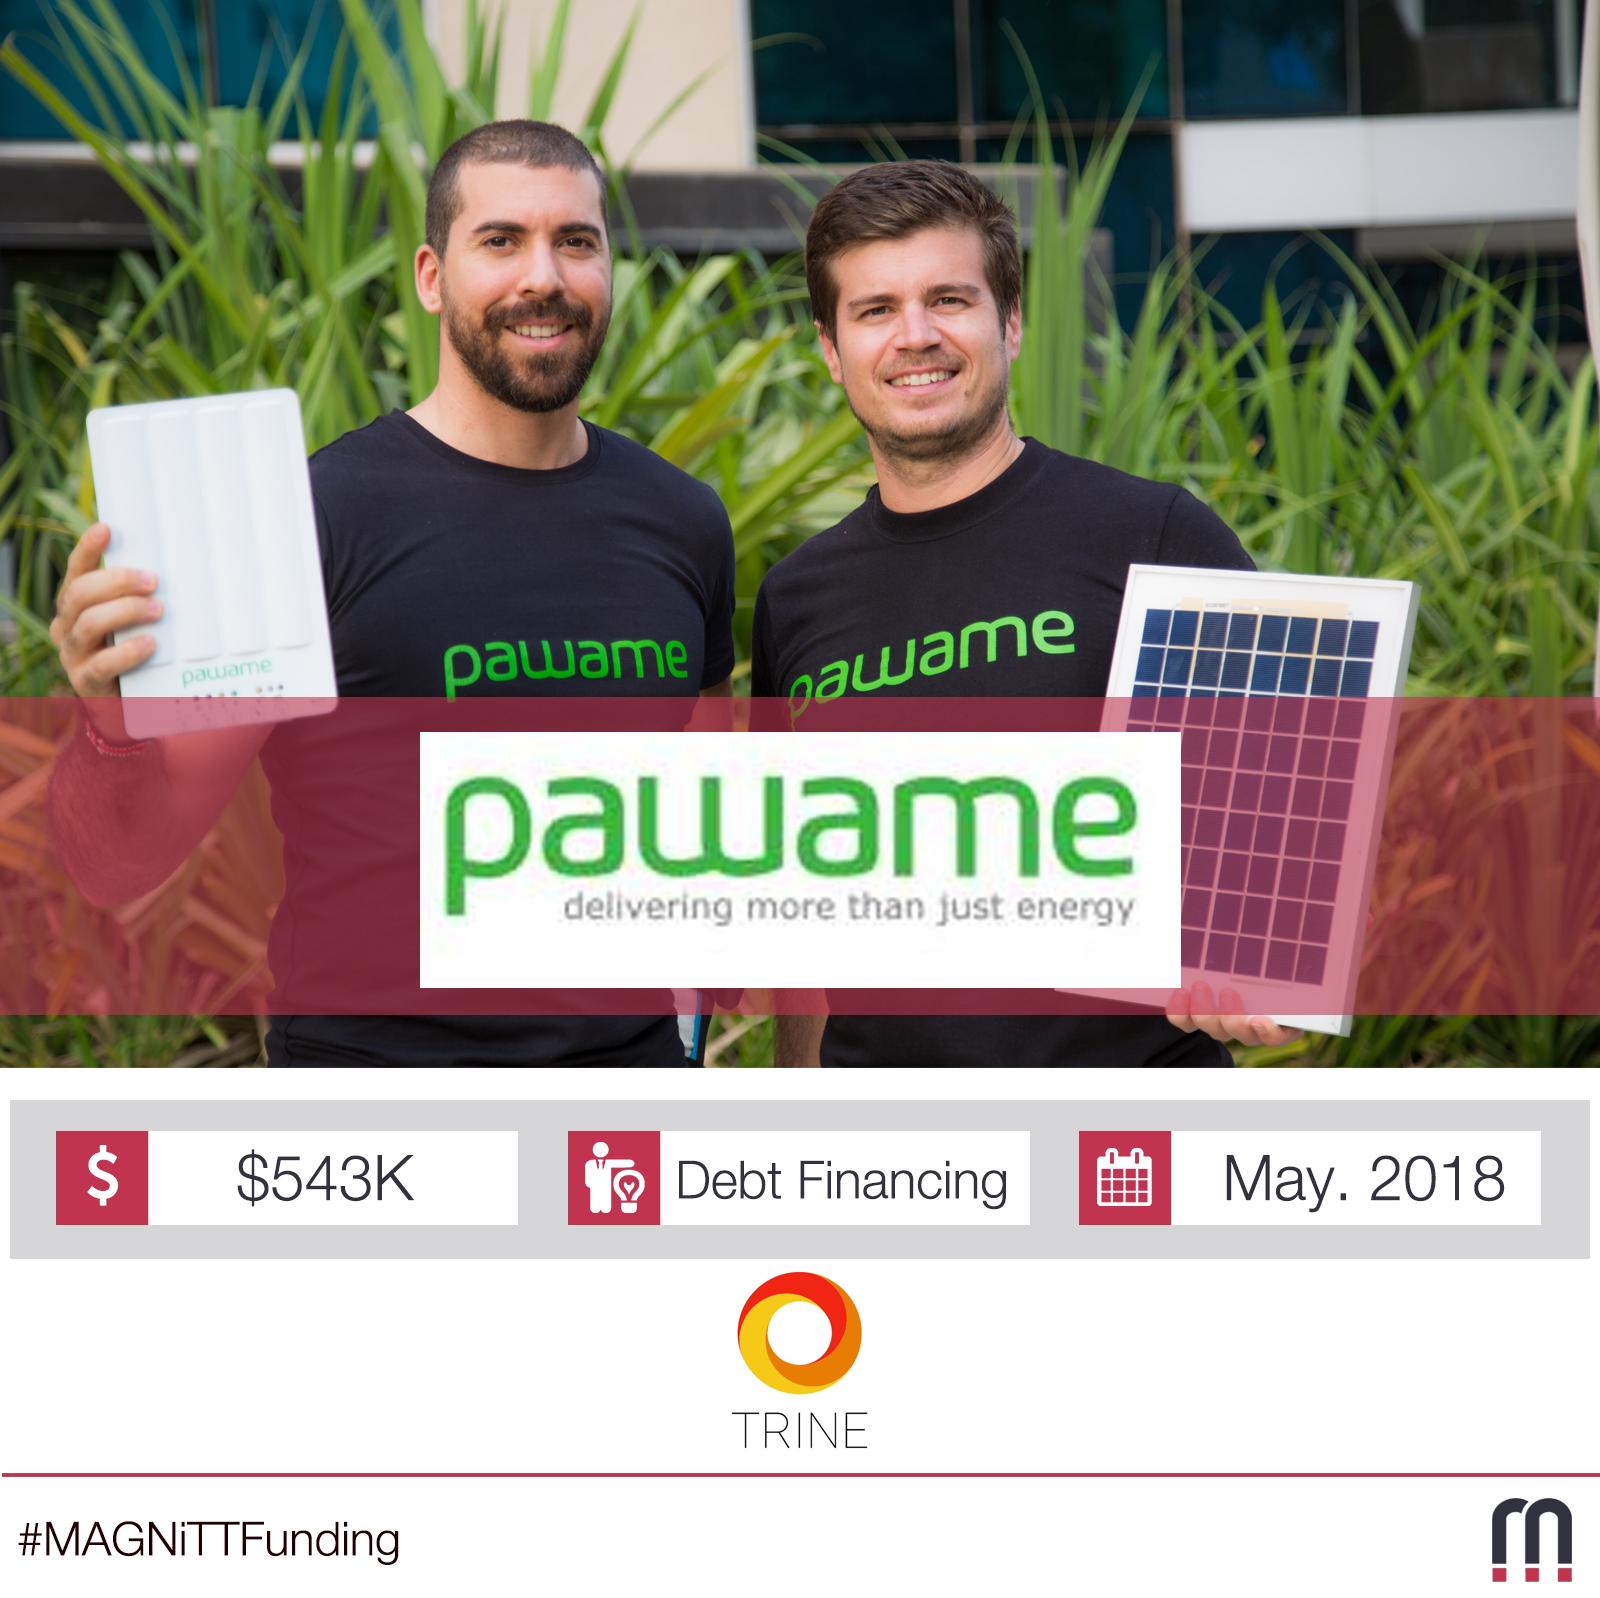 Pawame raises Half a Million USD in Debt Through Crowdfunding Campaign